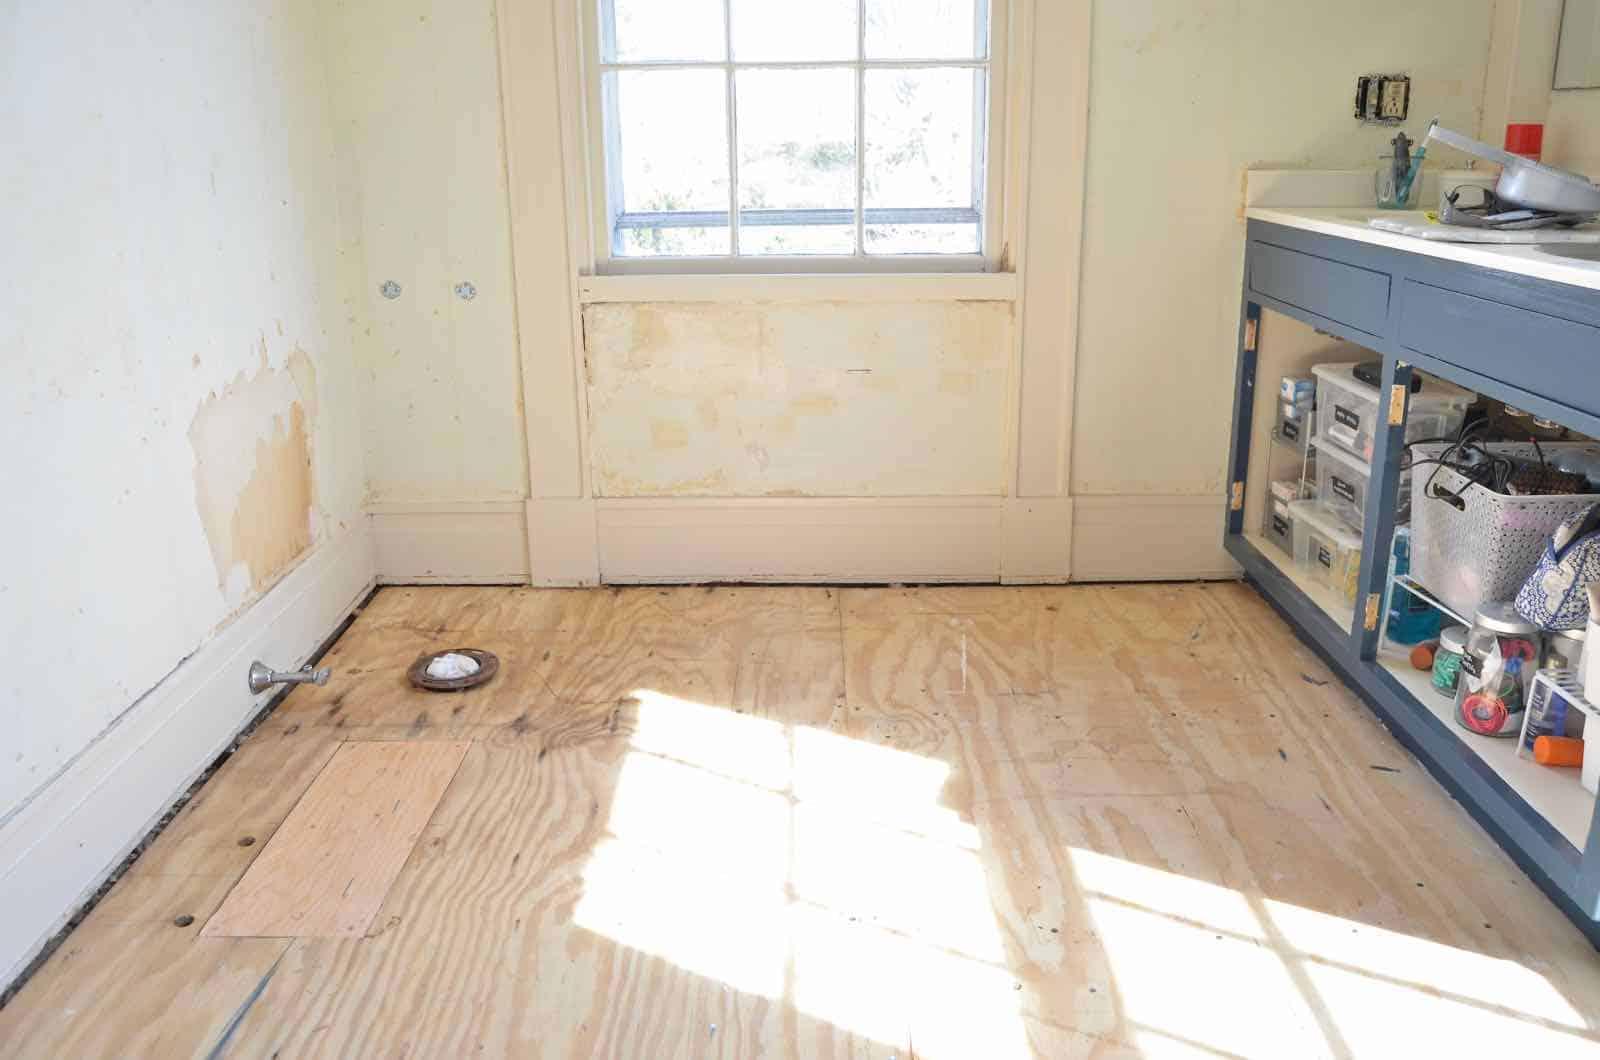 Floor tiling preparation